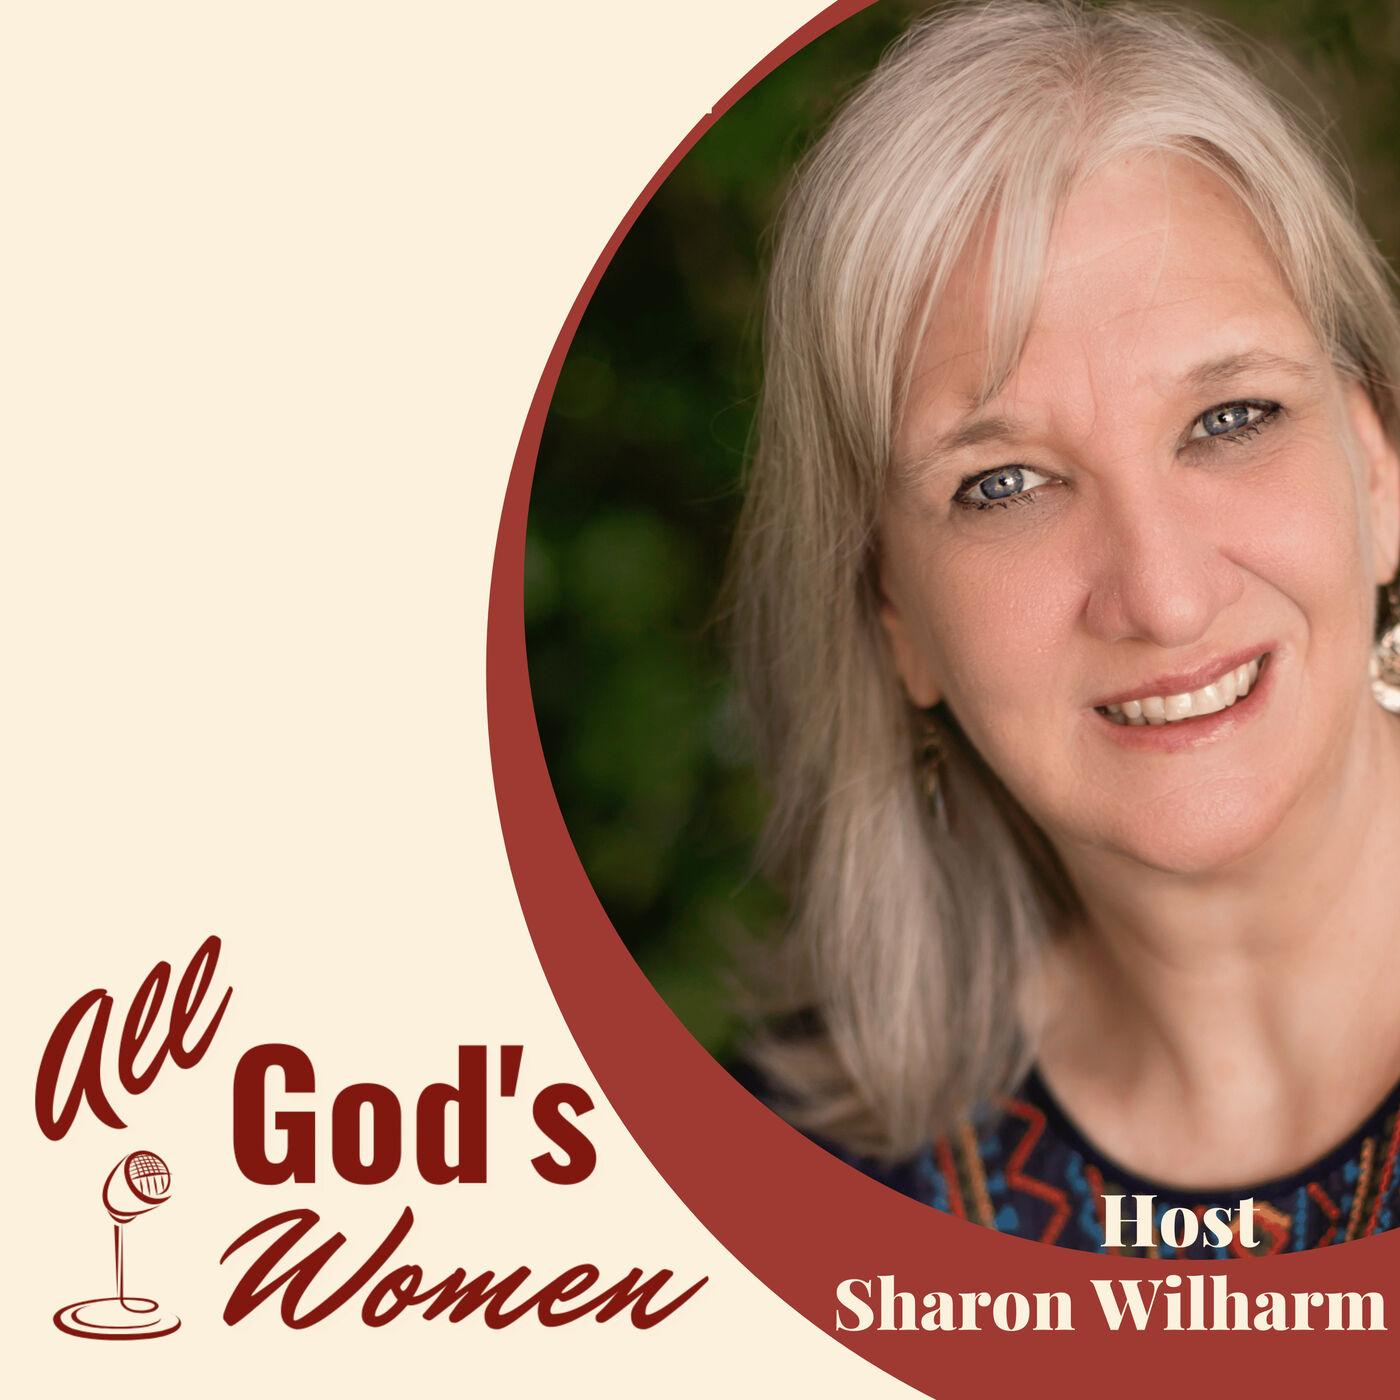 Rebekah the Deceiver: All God's Women radio